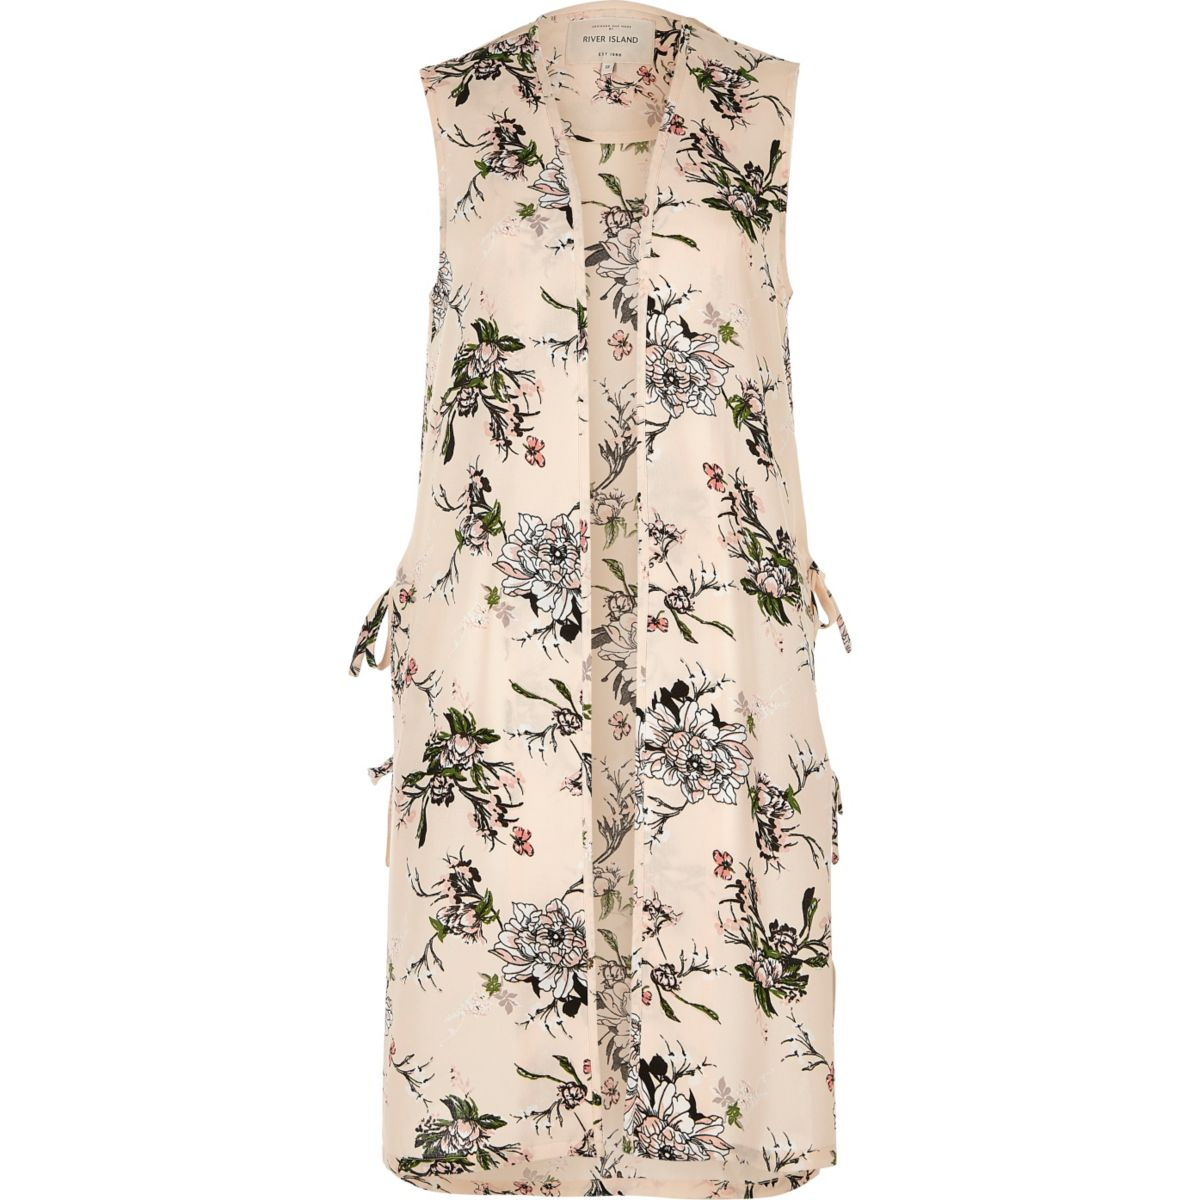 Cream floral print sleeveless duster jacket